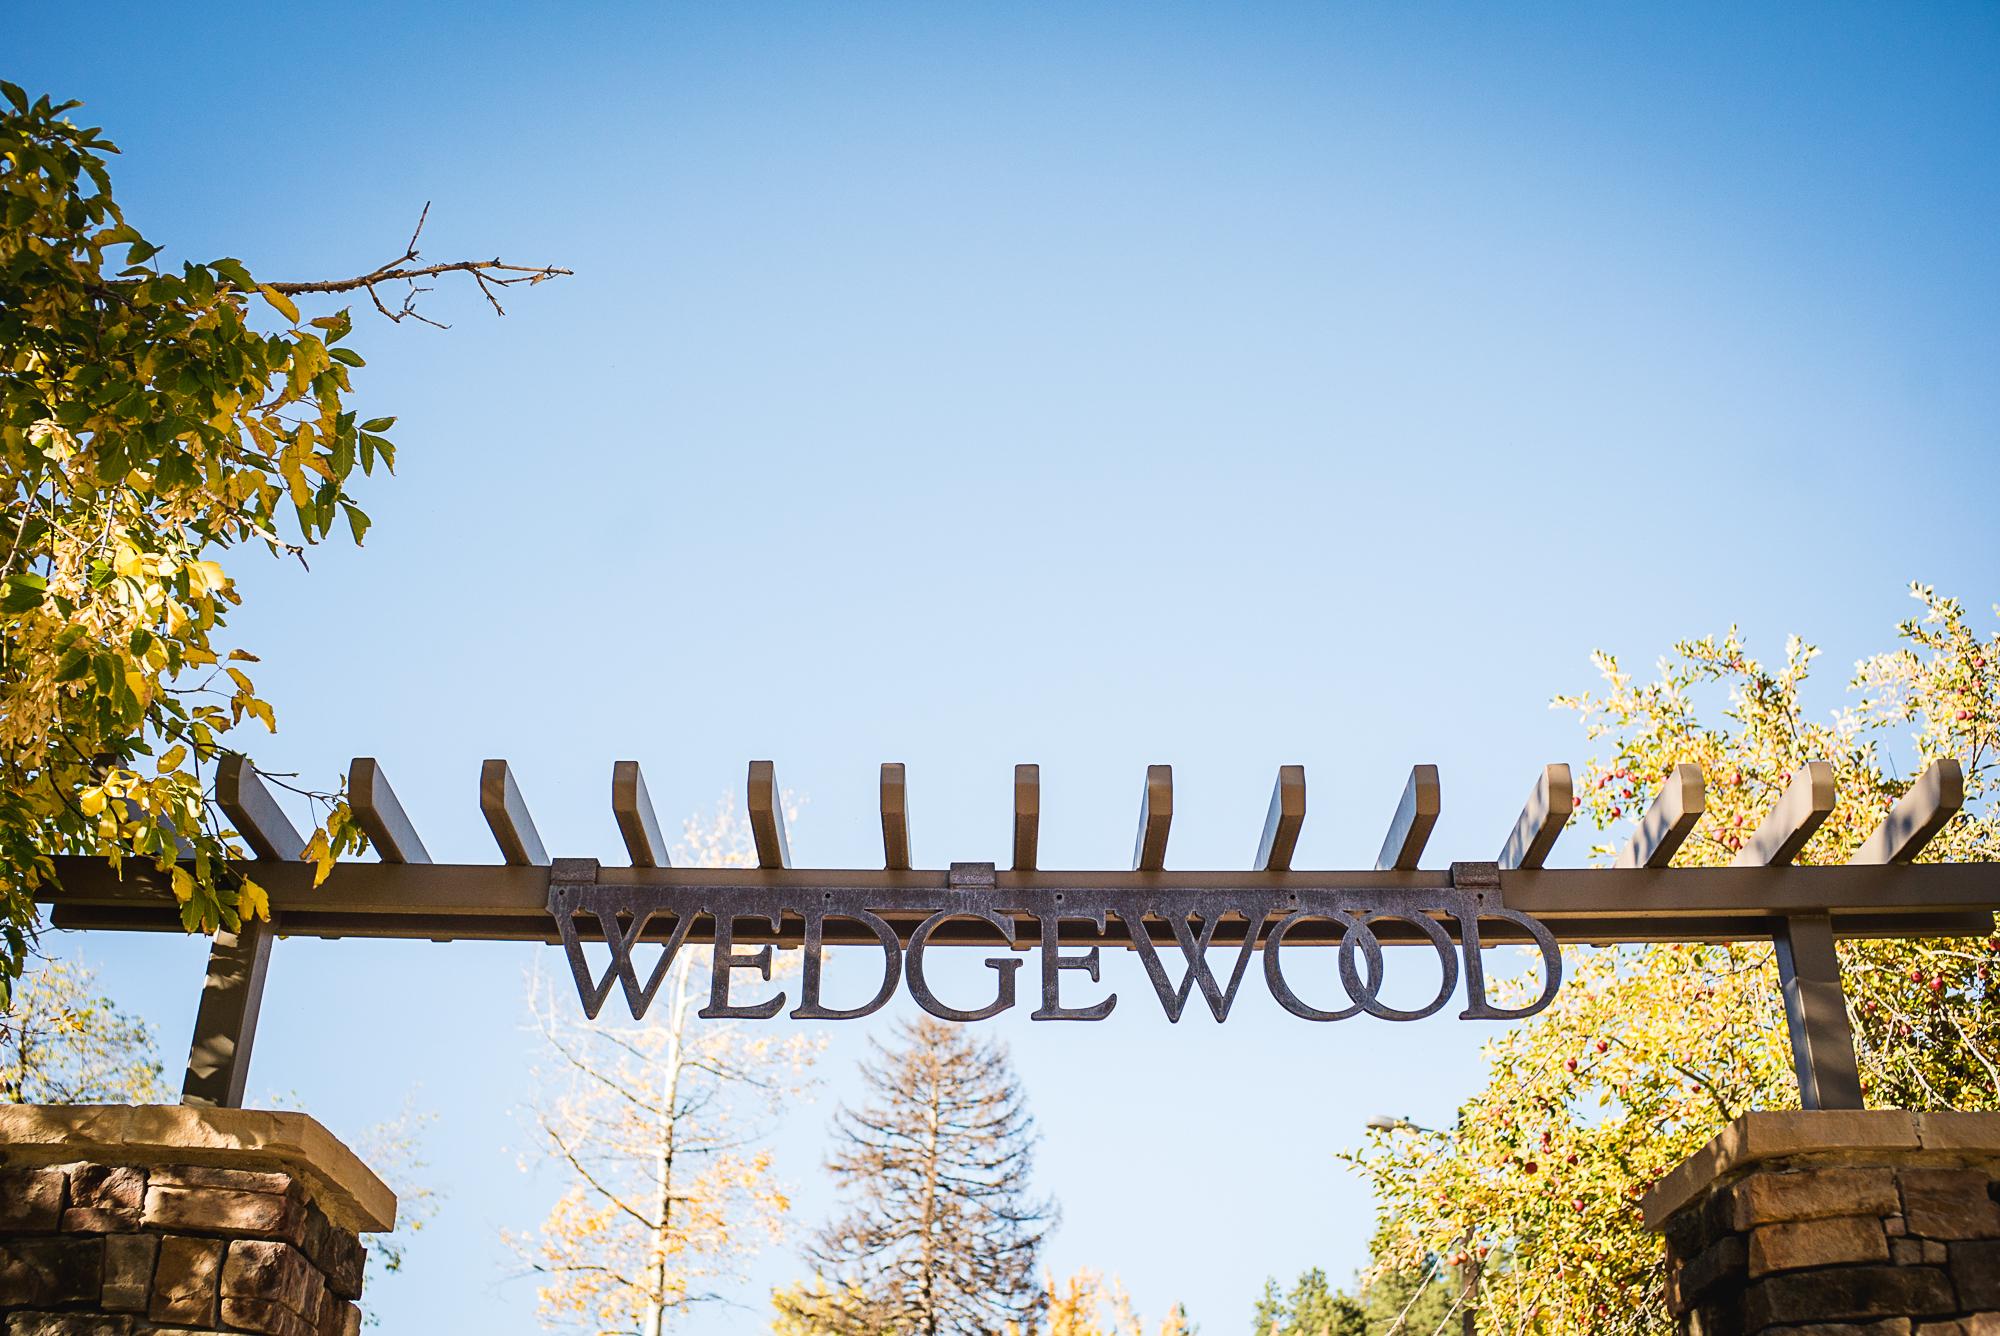 ckiffney-Boulder_Wedgewood-0015.jpg